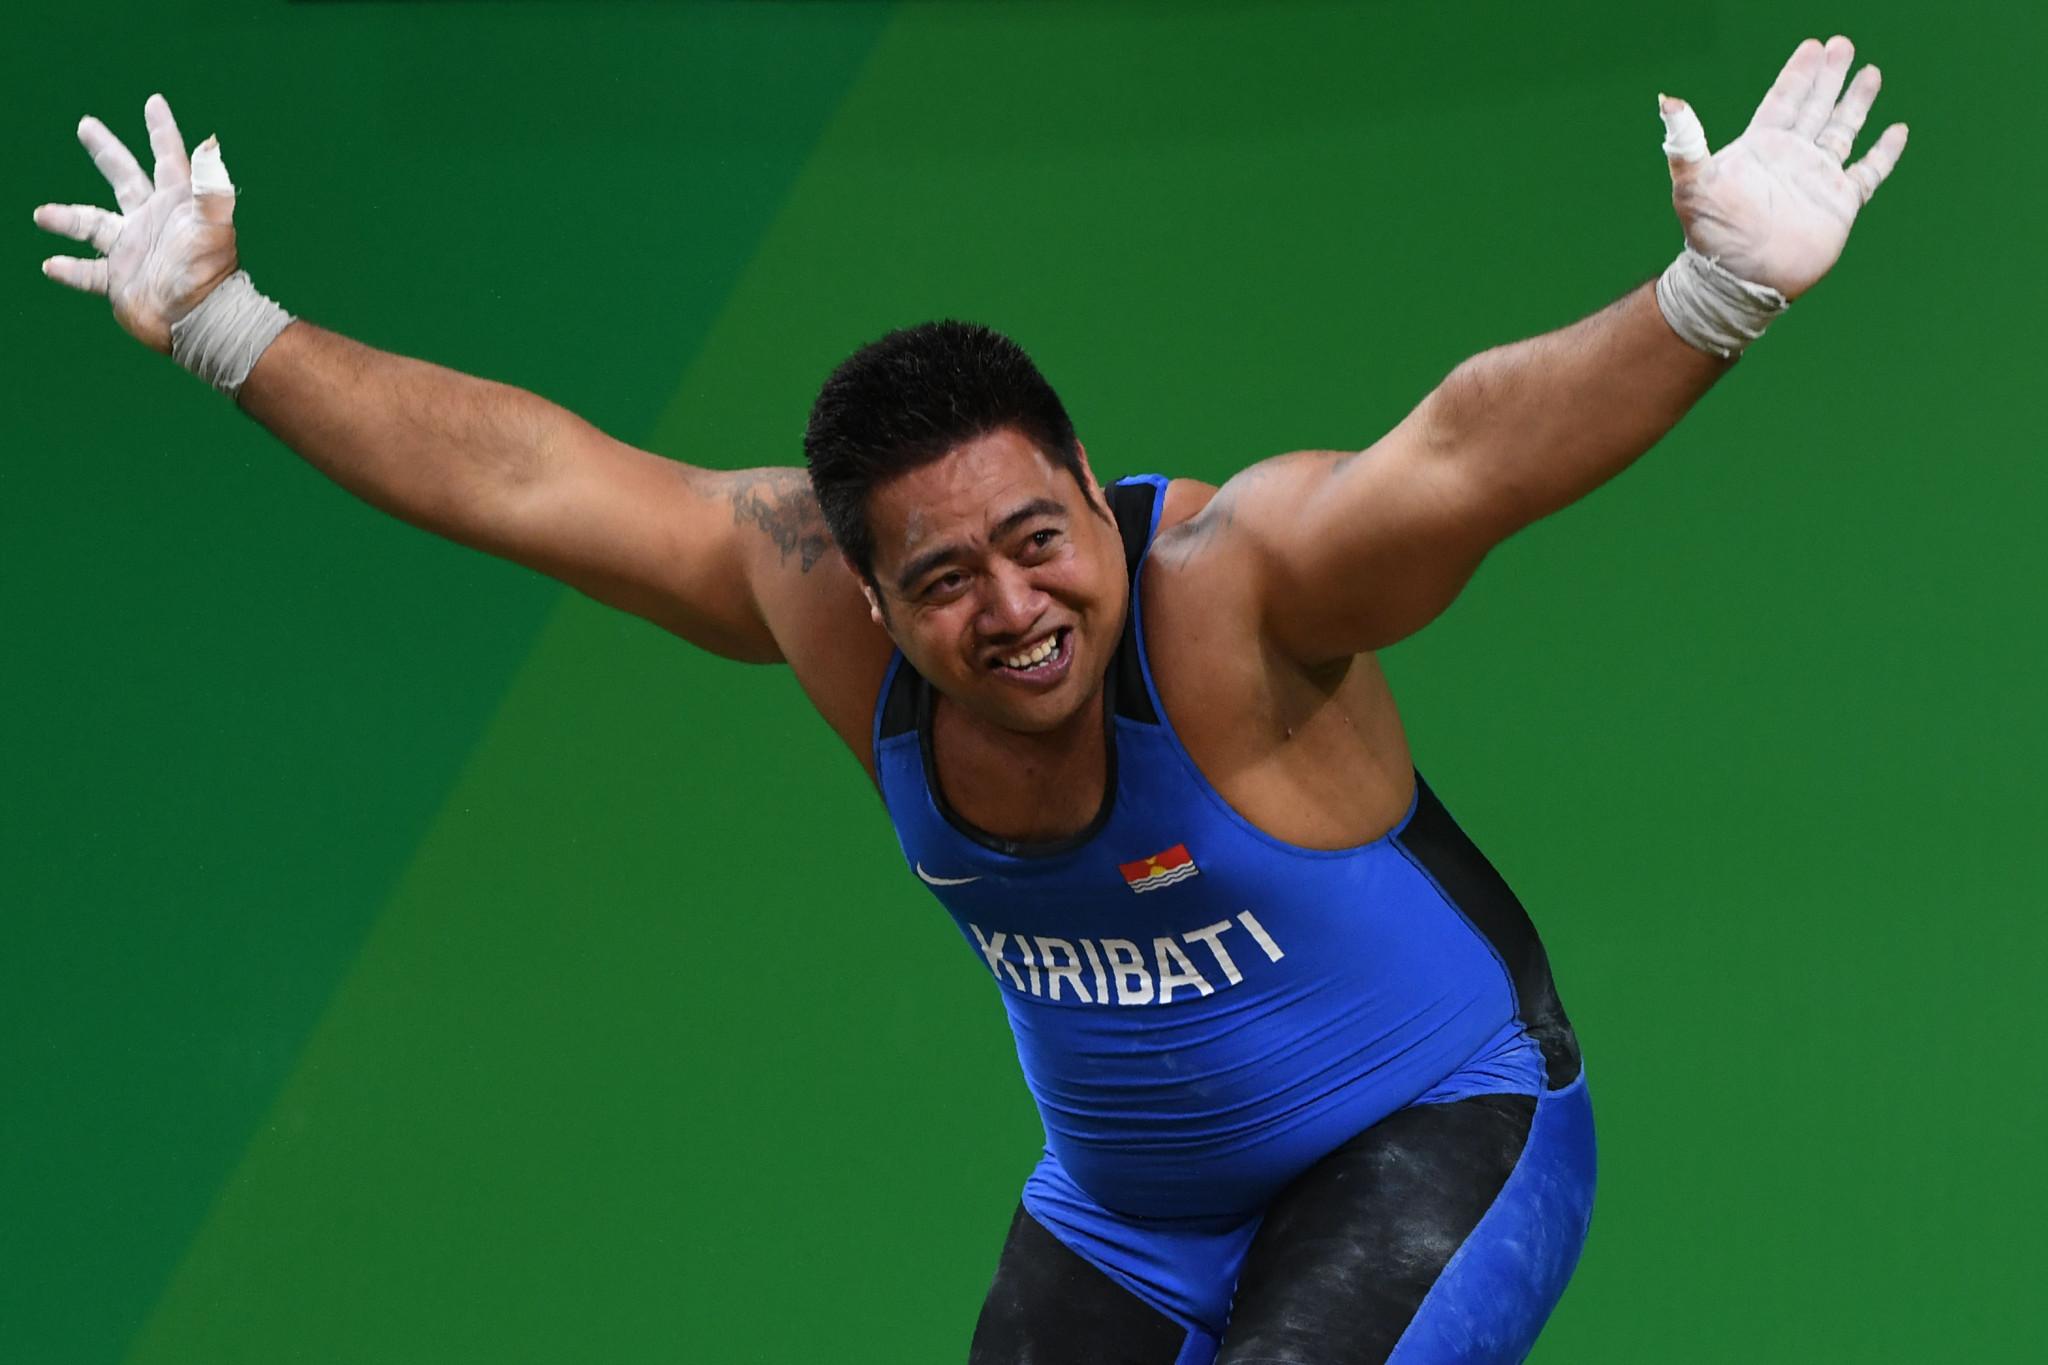 Kiribati's Commonwealth Games gold medallist Katoatau named ONOC ambassador for climate change